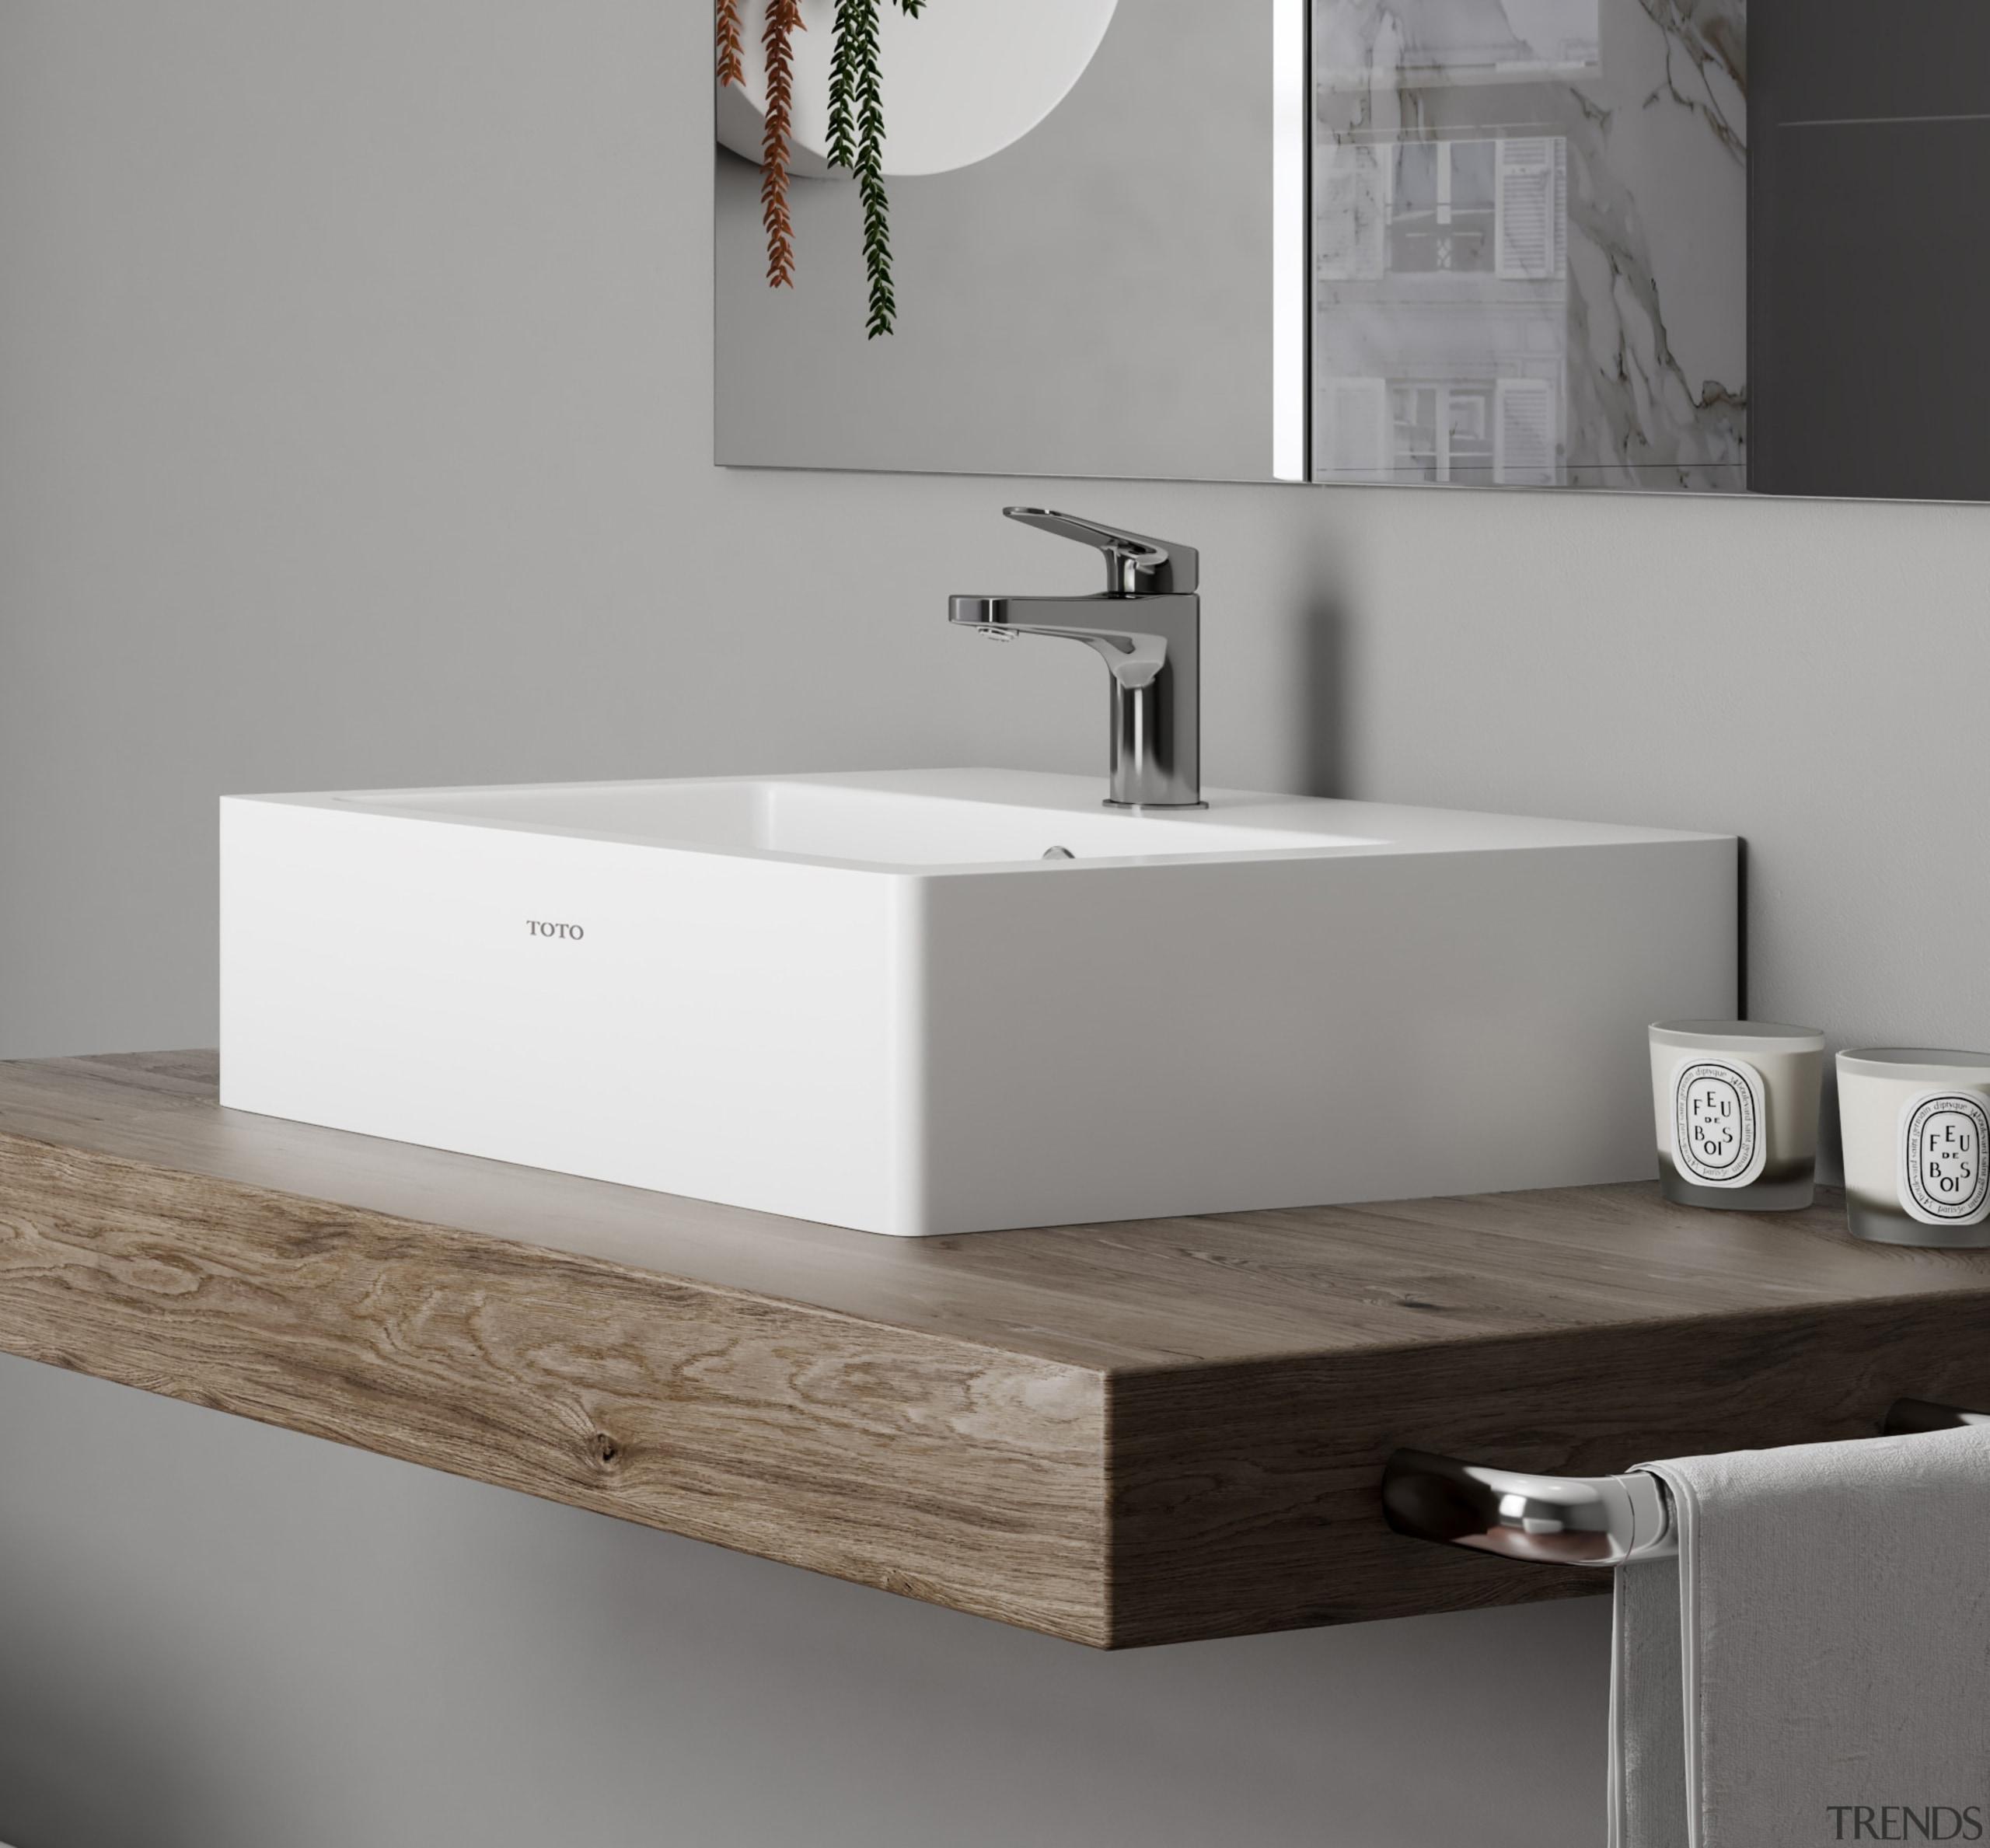 •10 year warranty•505 x 505mm•Vitreous china•Includes 1 tap angle, bathroom, bathroom accessory, bathroom cabinet, bathroom sink, ceramic, drawer, floor, furniture, plumbing fixture, sink, tap, gray